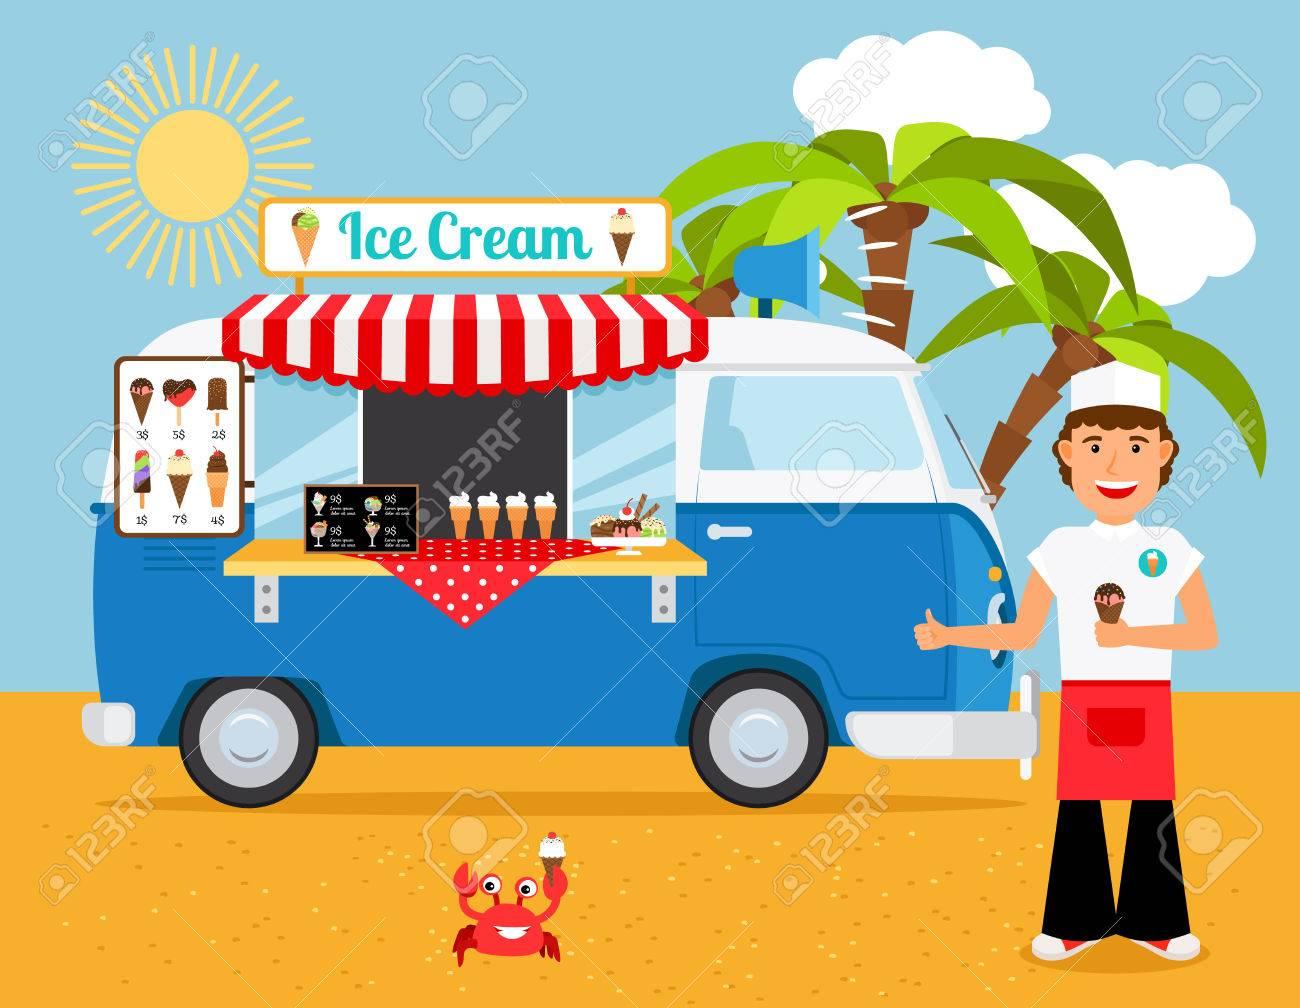 Ice Cream Truck Vector Illustration Iceman And Icecream Van On Sandy Beach With Palm Trees